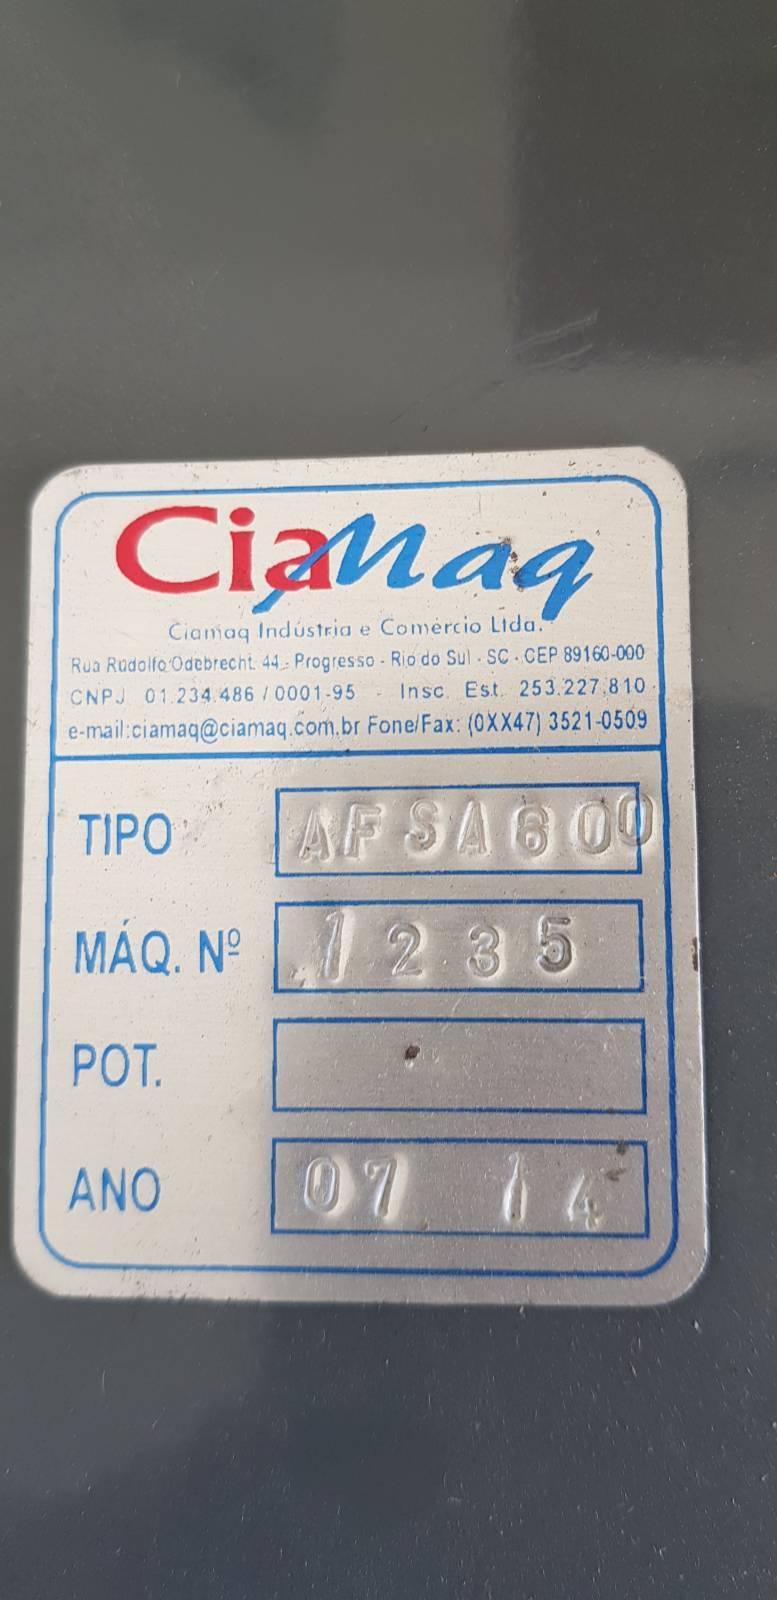 Afiadeira Semi automática AFSA 610 Ciamaq - Kimaq